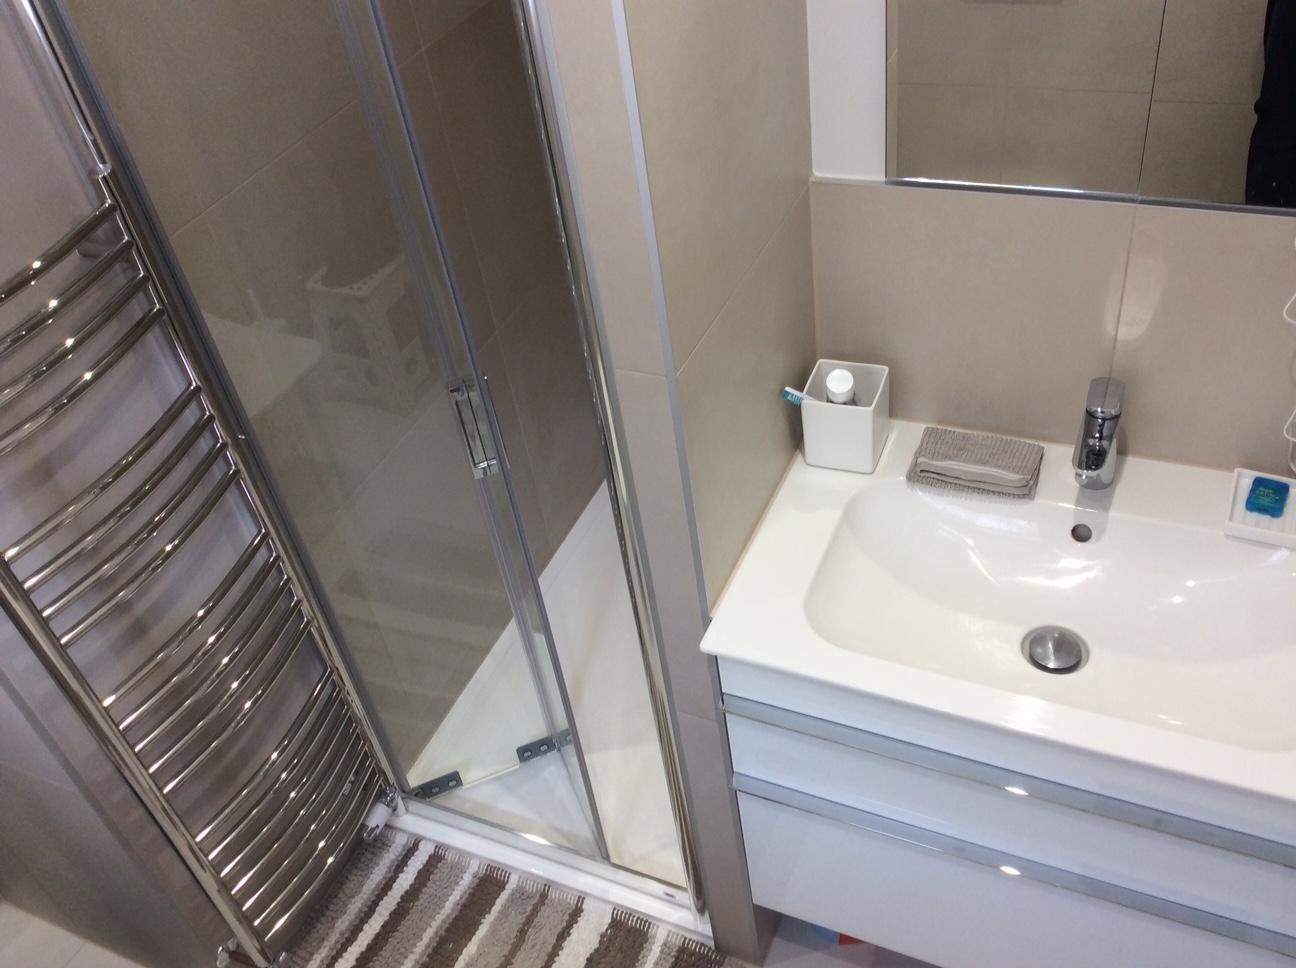 V&B Venticello, Aqeuous Bathrooms, Princes Risborough, Buckinghamshire